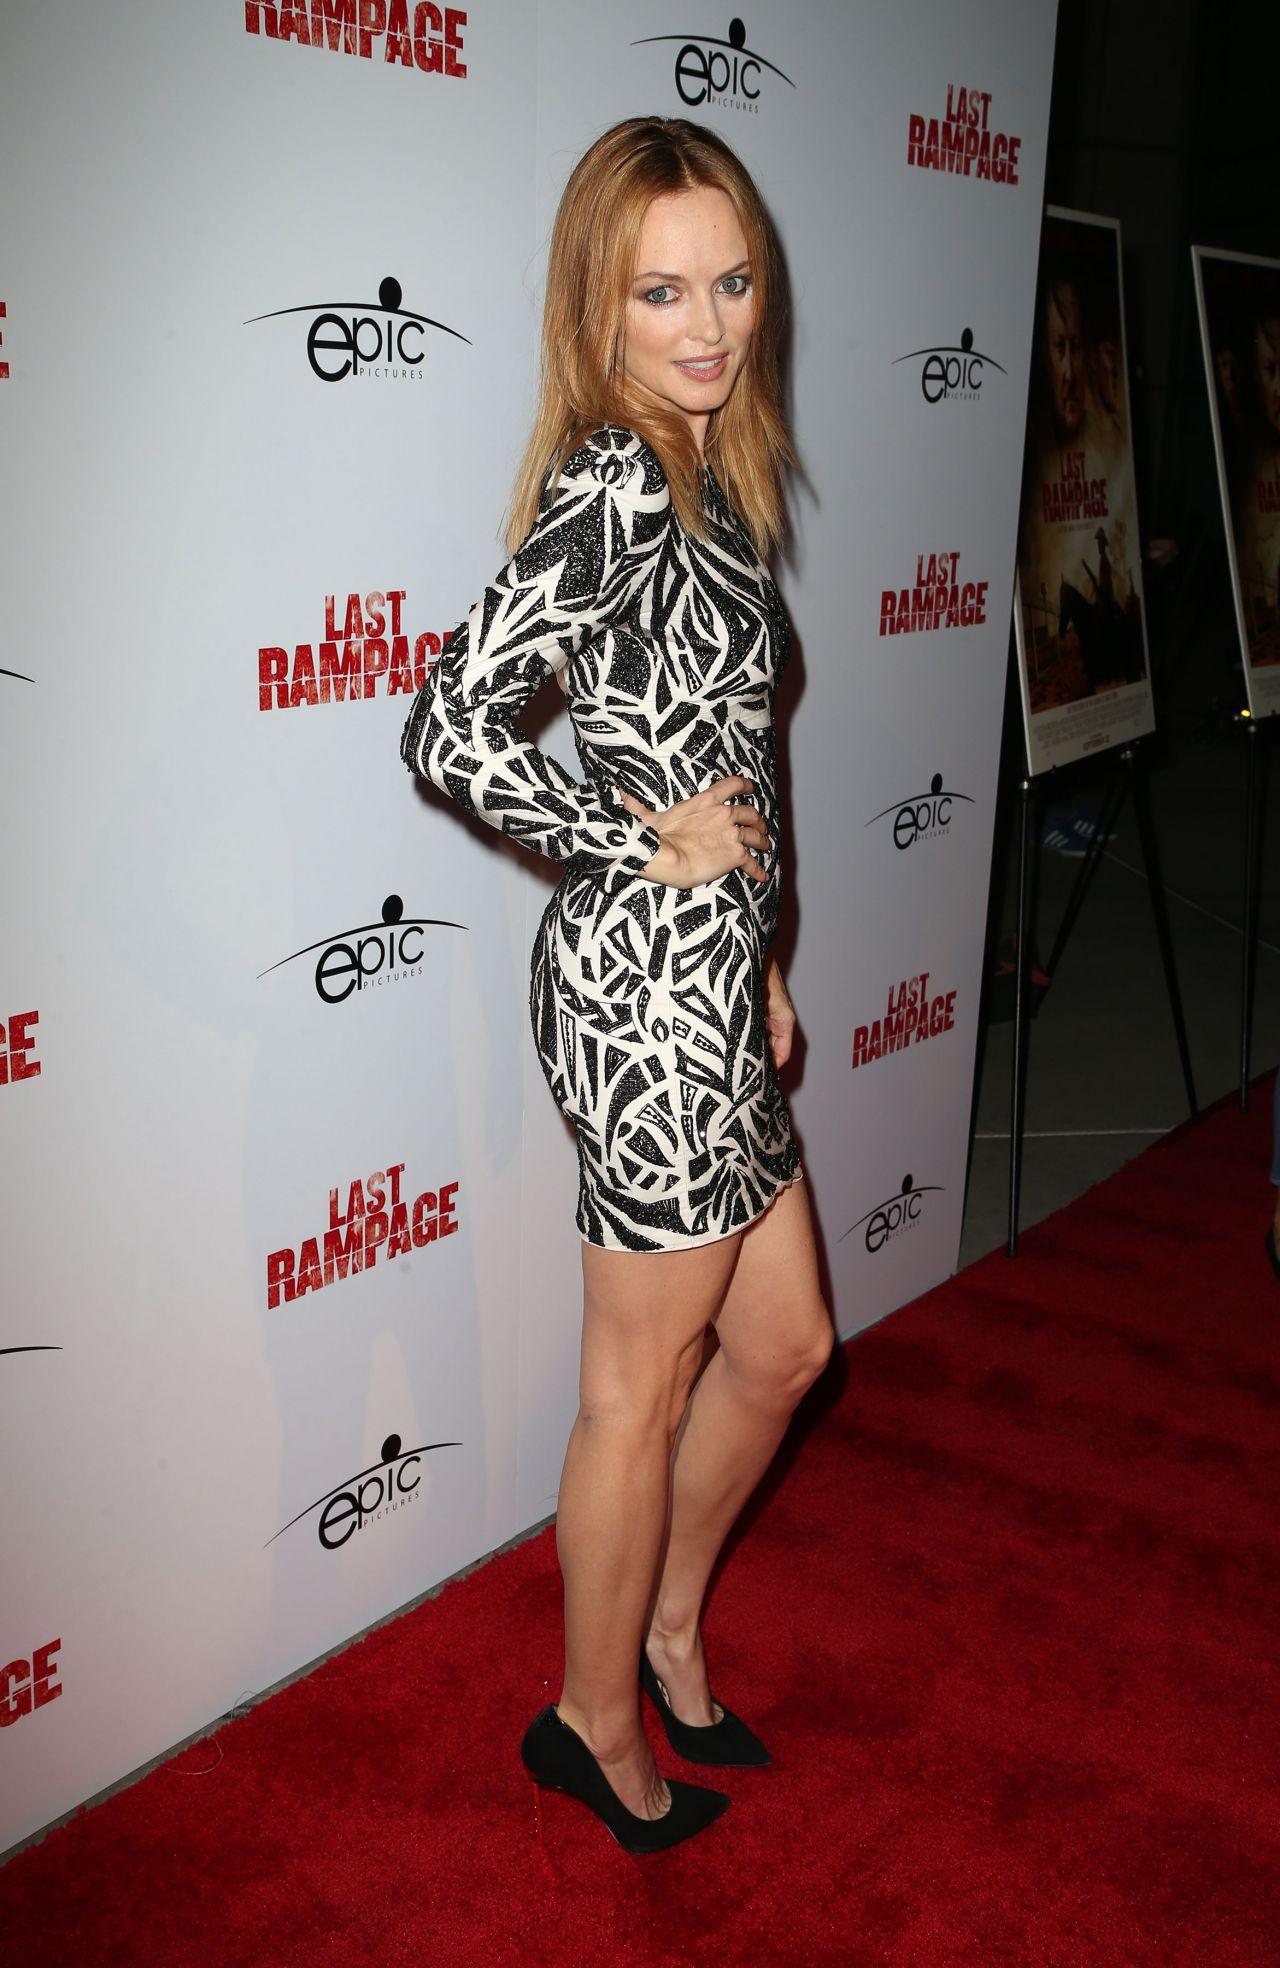 Heather Graham The Last Rampage Movie Premiere In Los